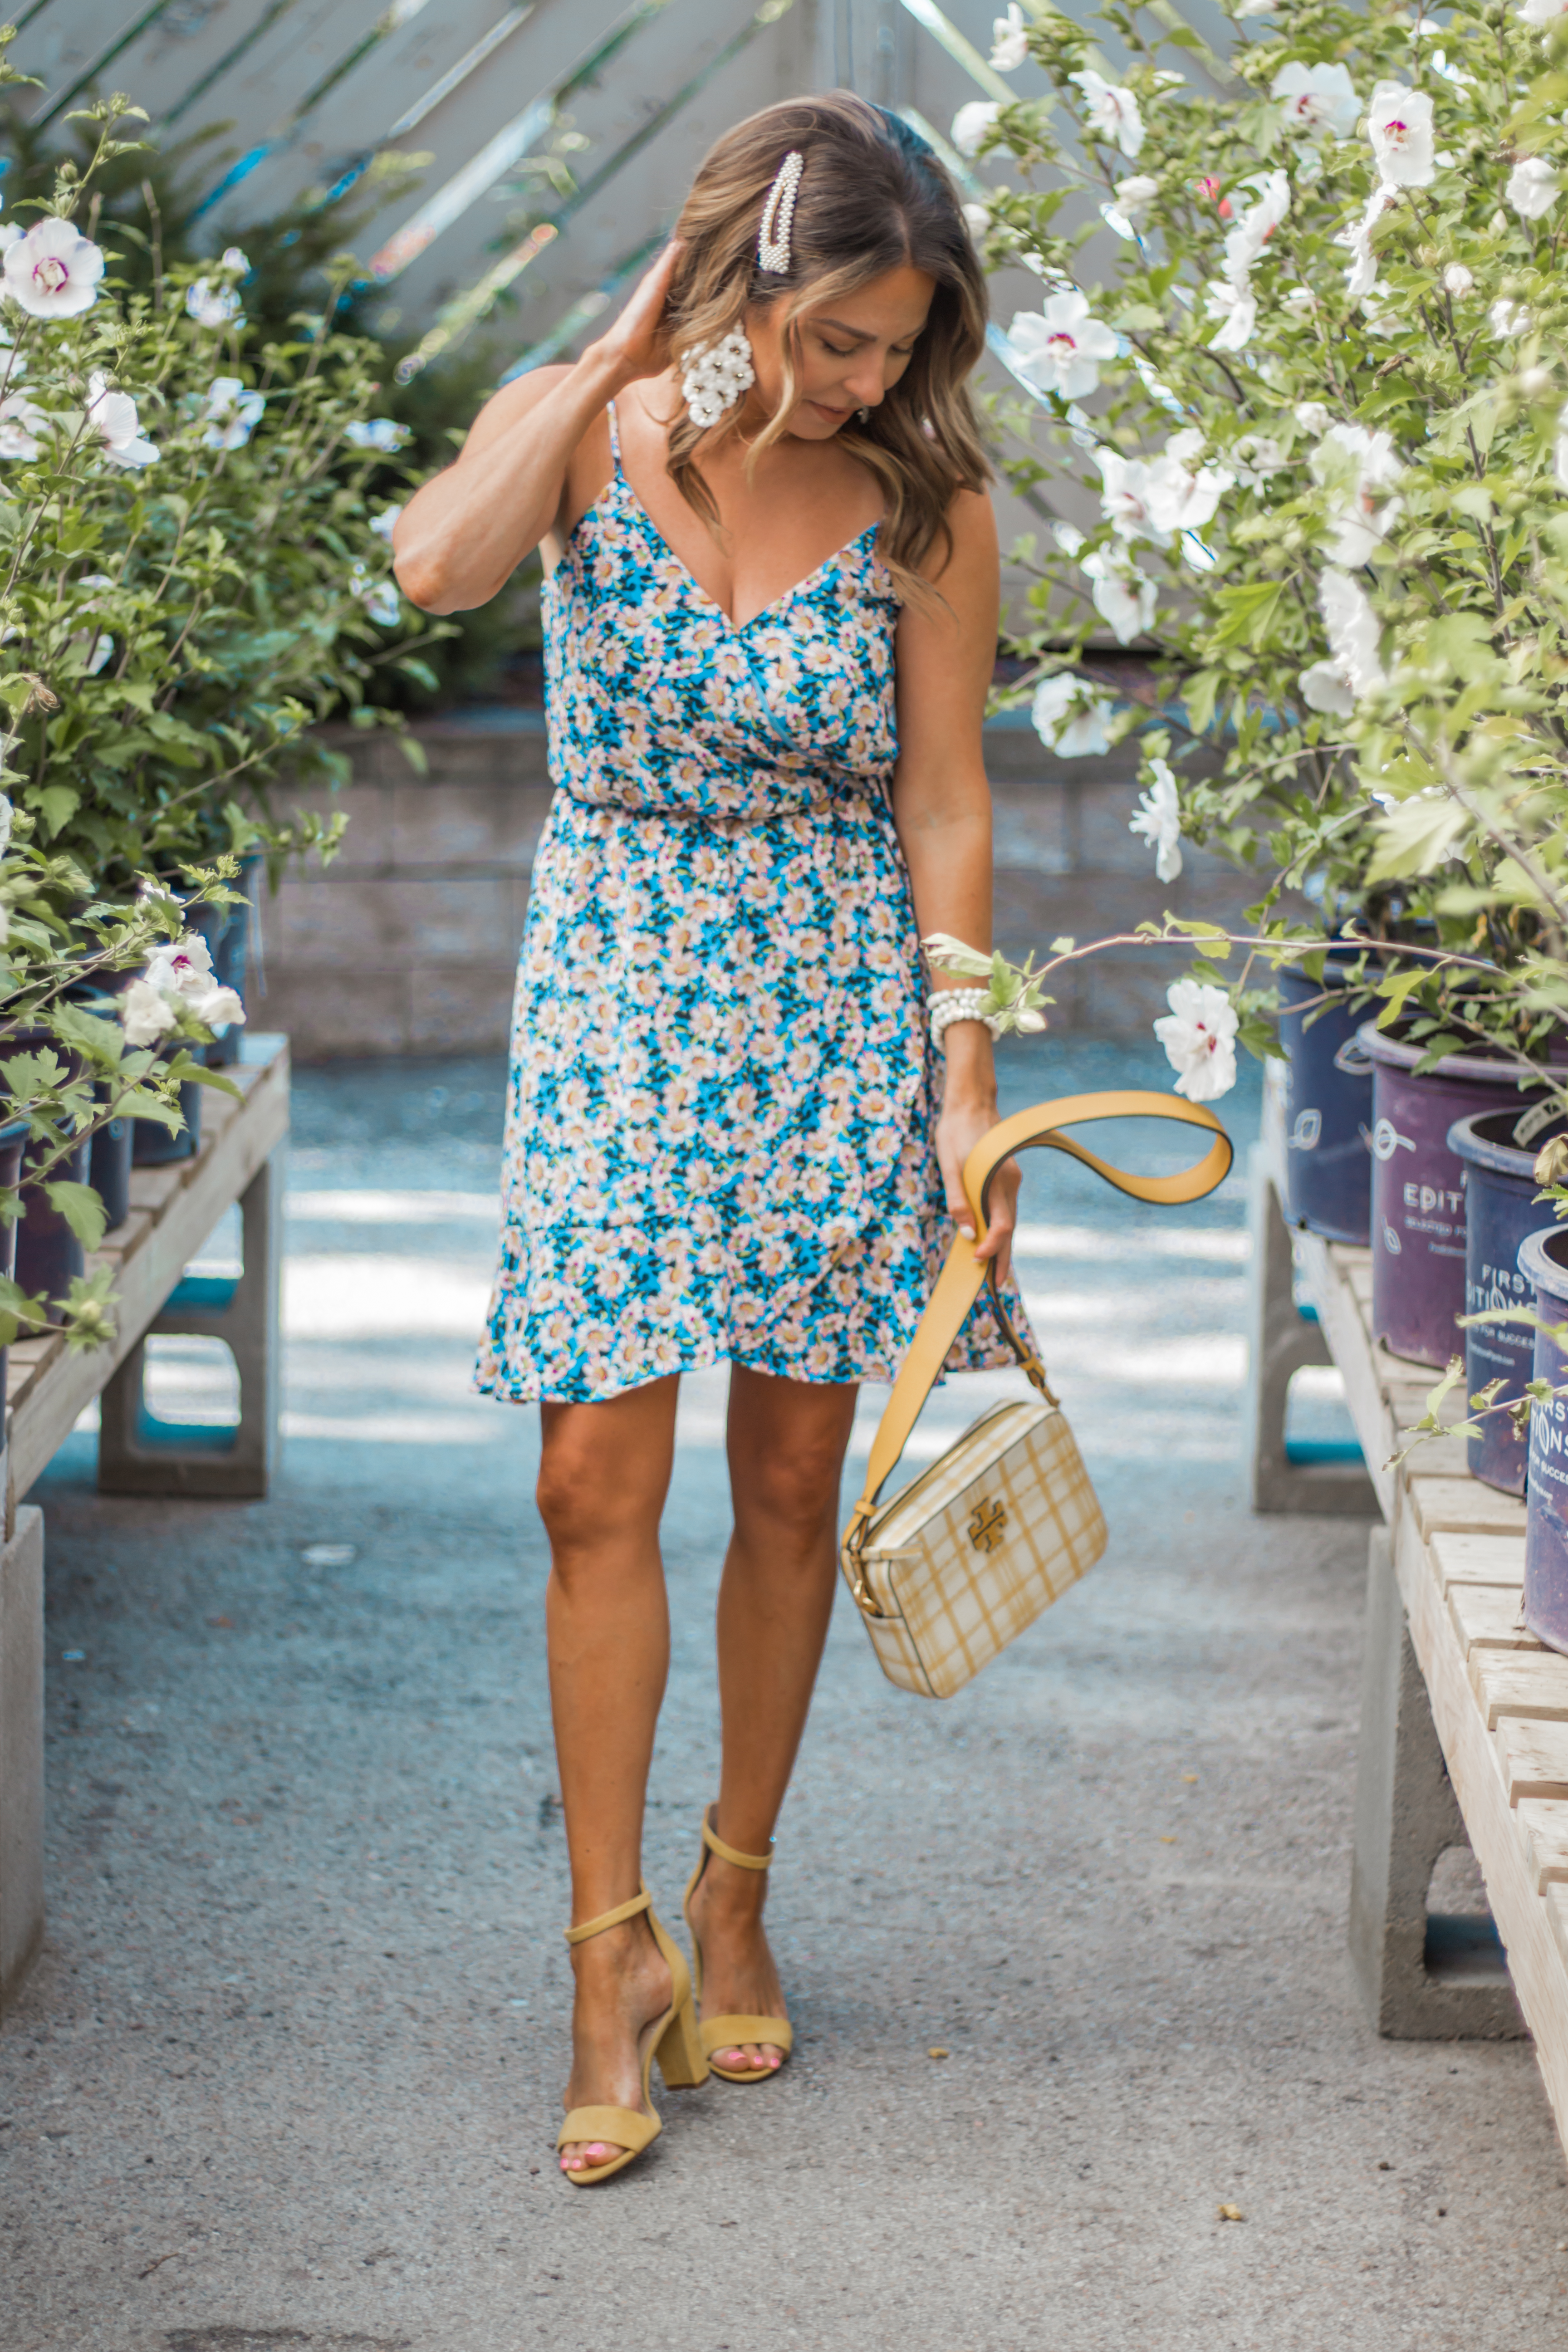 Women's Fashion-Sabby Style-Summer Fashion-Summer Dress-Pearl Barrette-Wide Brim Hat-Hair Accessories-Omaha Blogger-Nebraska Blogger-Colorful Style-Floral Dress-2